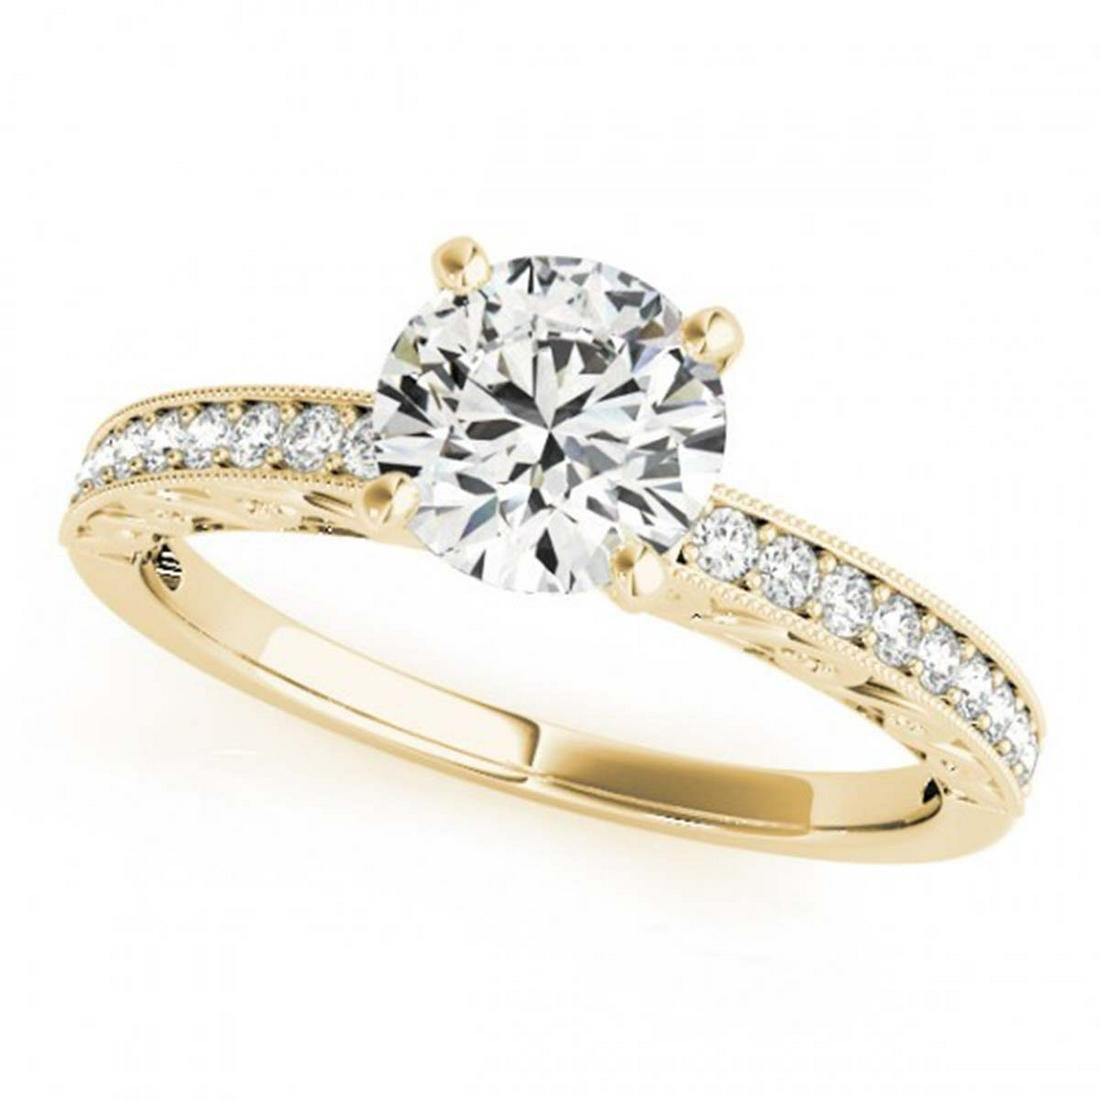 0.70 ctw VS/SI Diamond Ring 18K Yellow Gold - REF-86Y4X